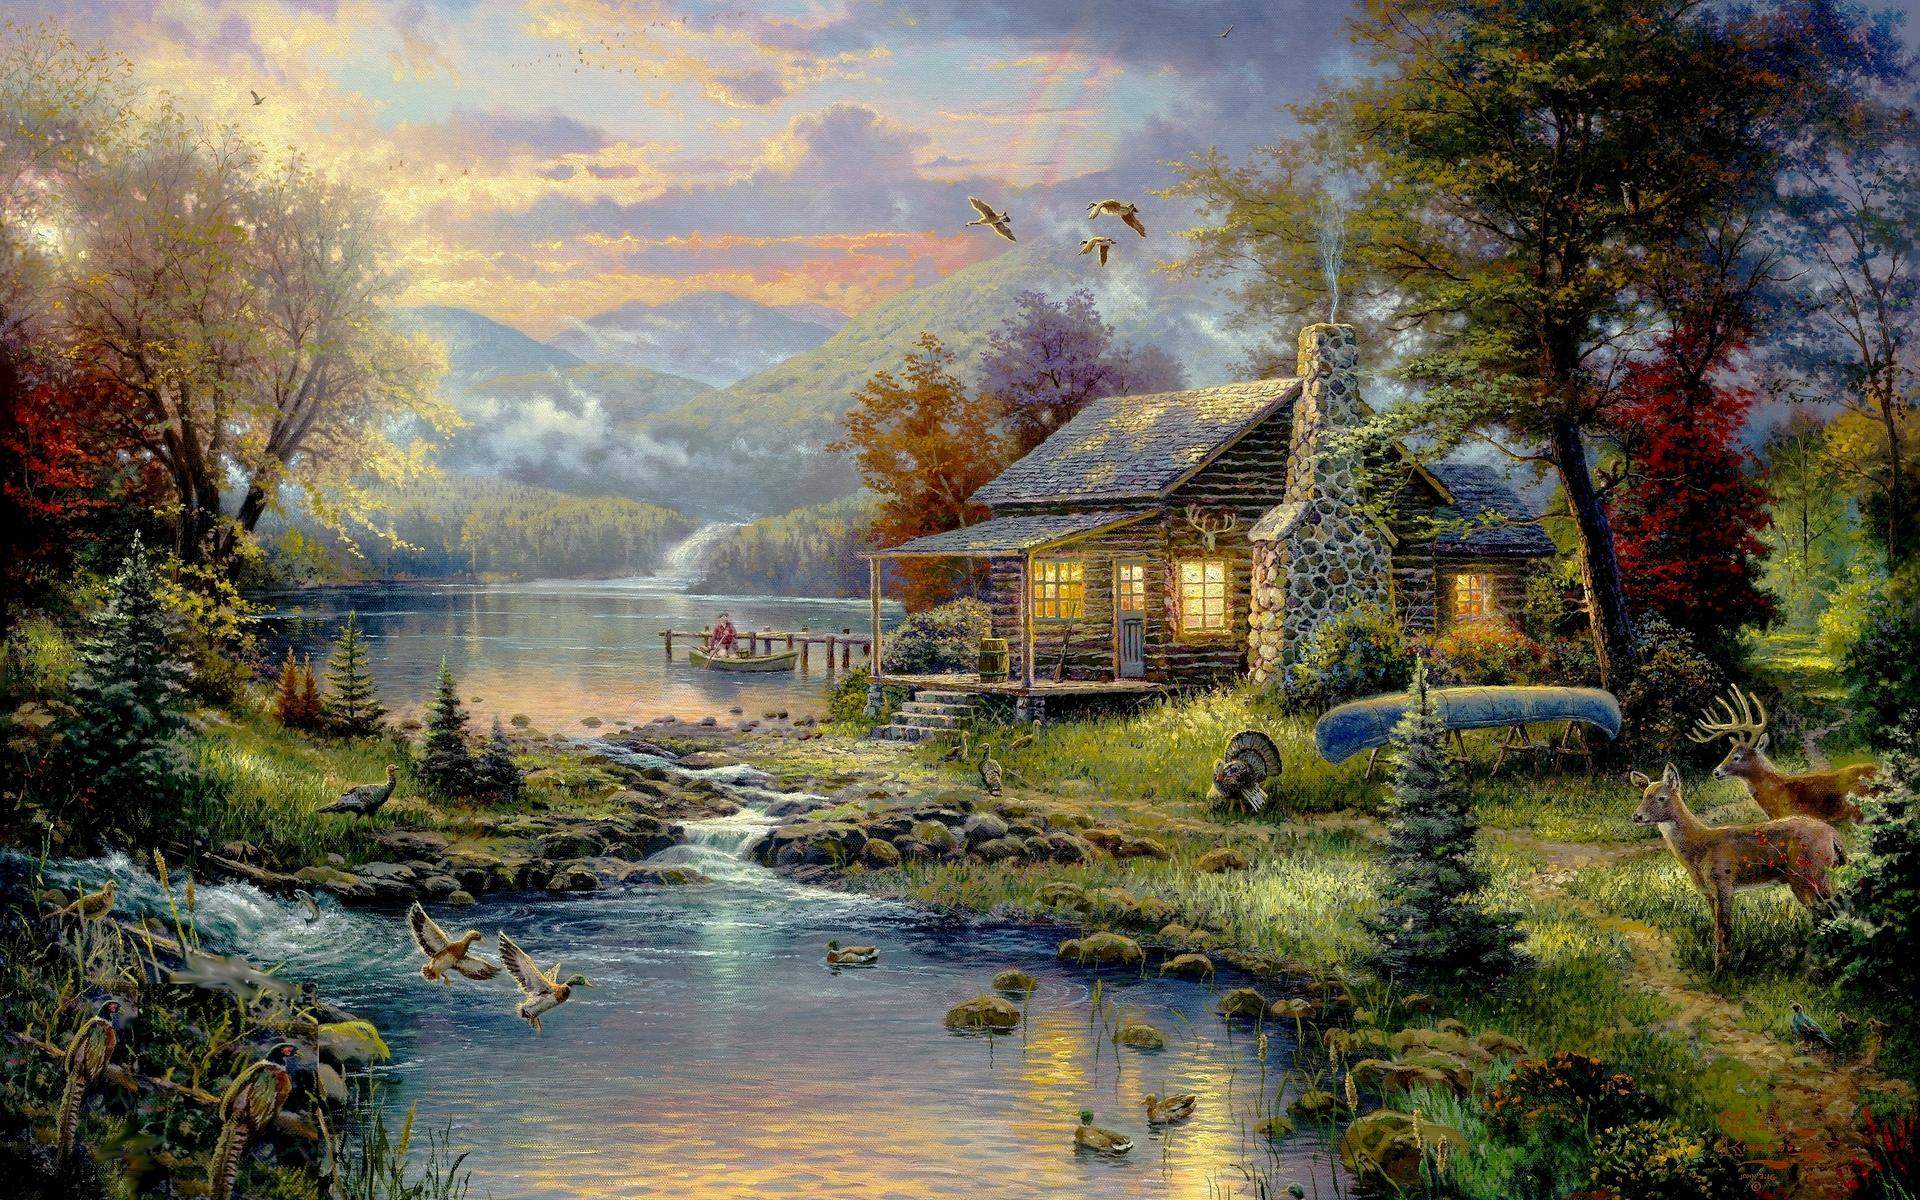 Country House Wallpaper Art Paintings HD Desktop Wallpapers 1920x1200